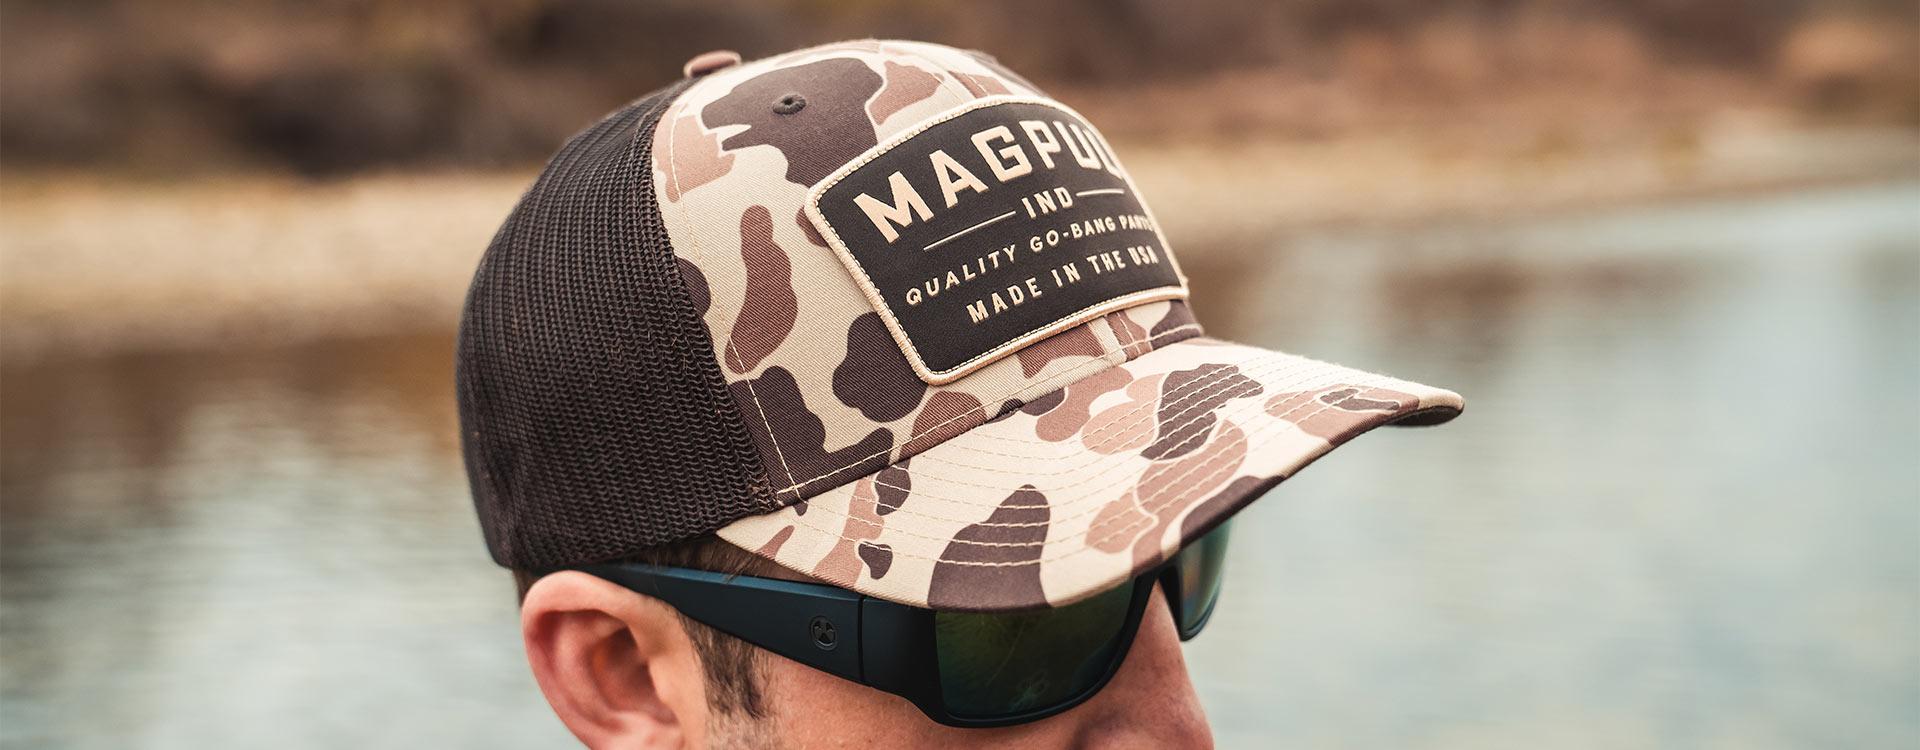 Magpul Go Bang Trucker in Raider Camo on man wearing Magpul Eyewear outdoors near lake